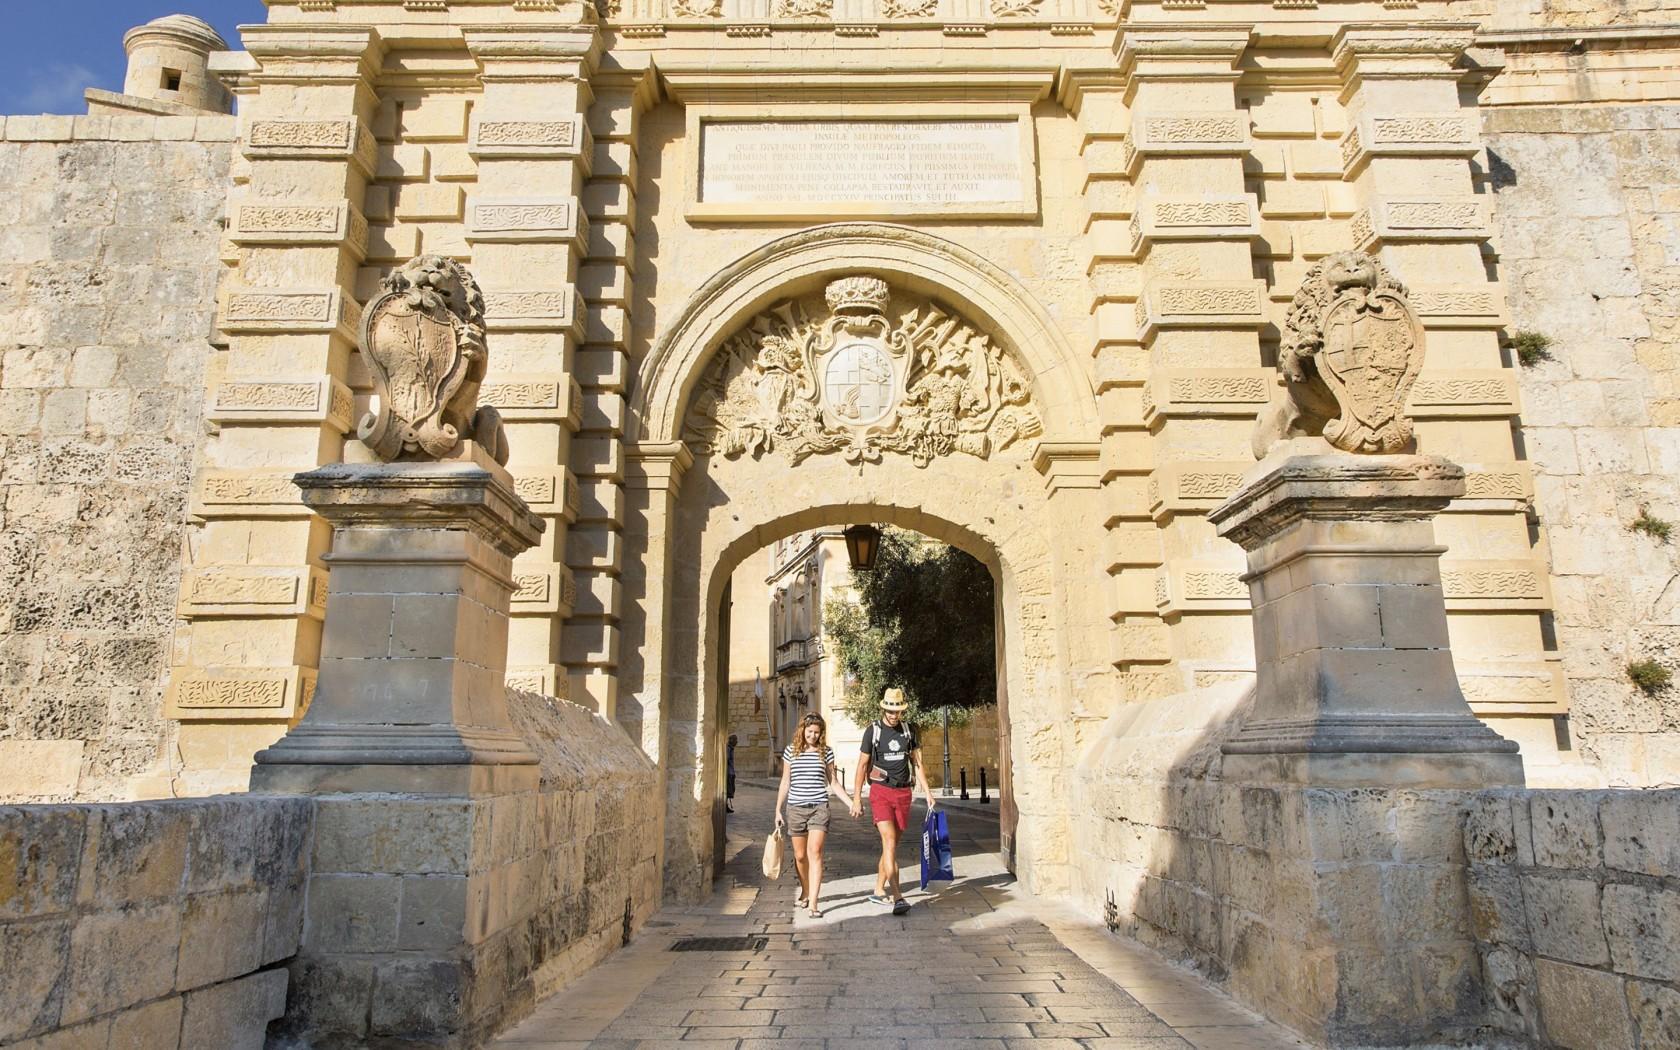 Game of Thrones Filming Location - Mdina, Malta